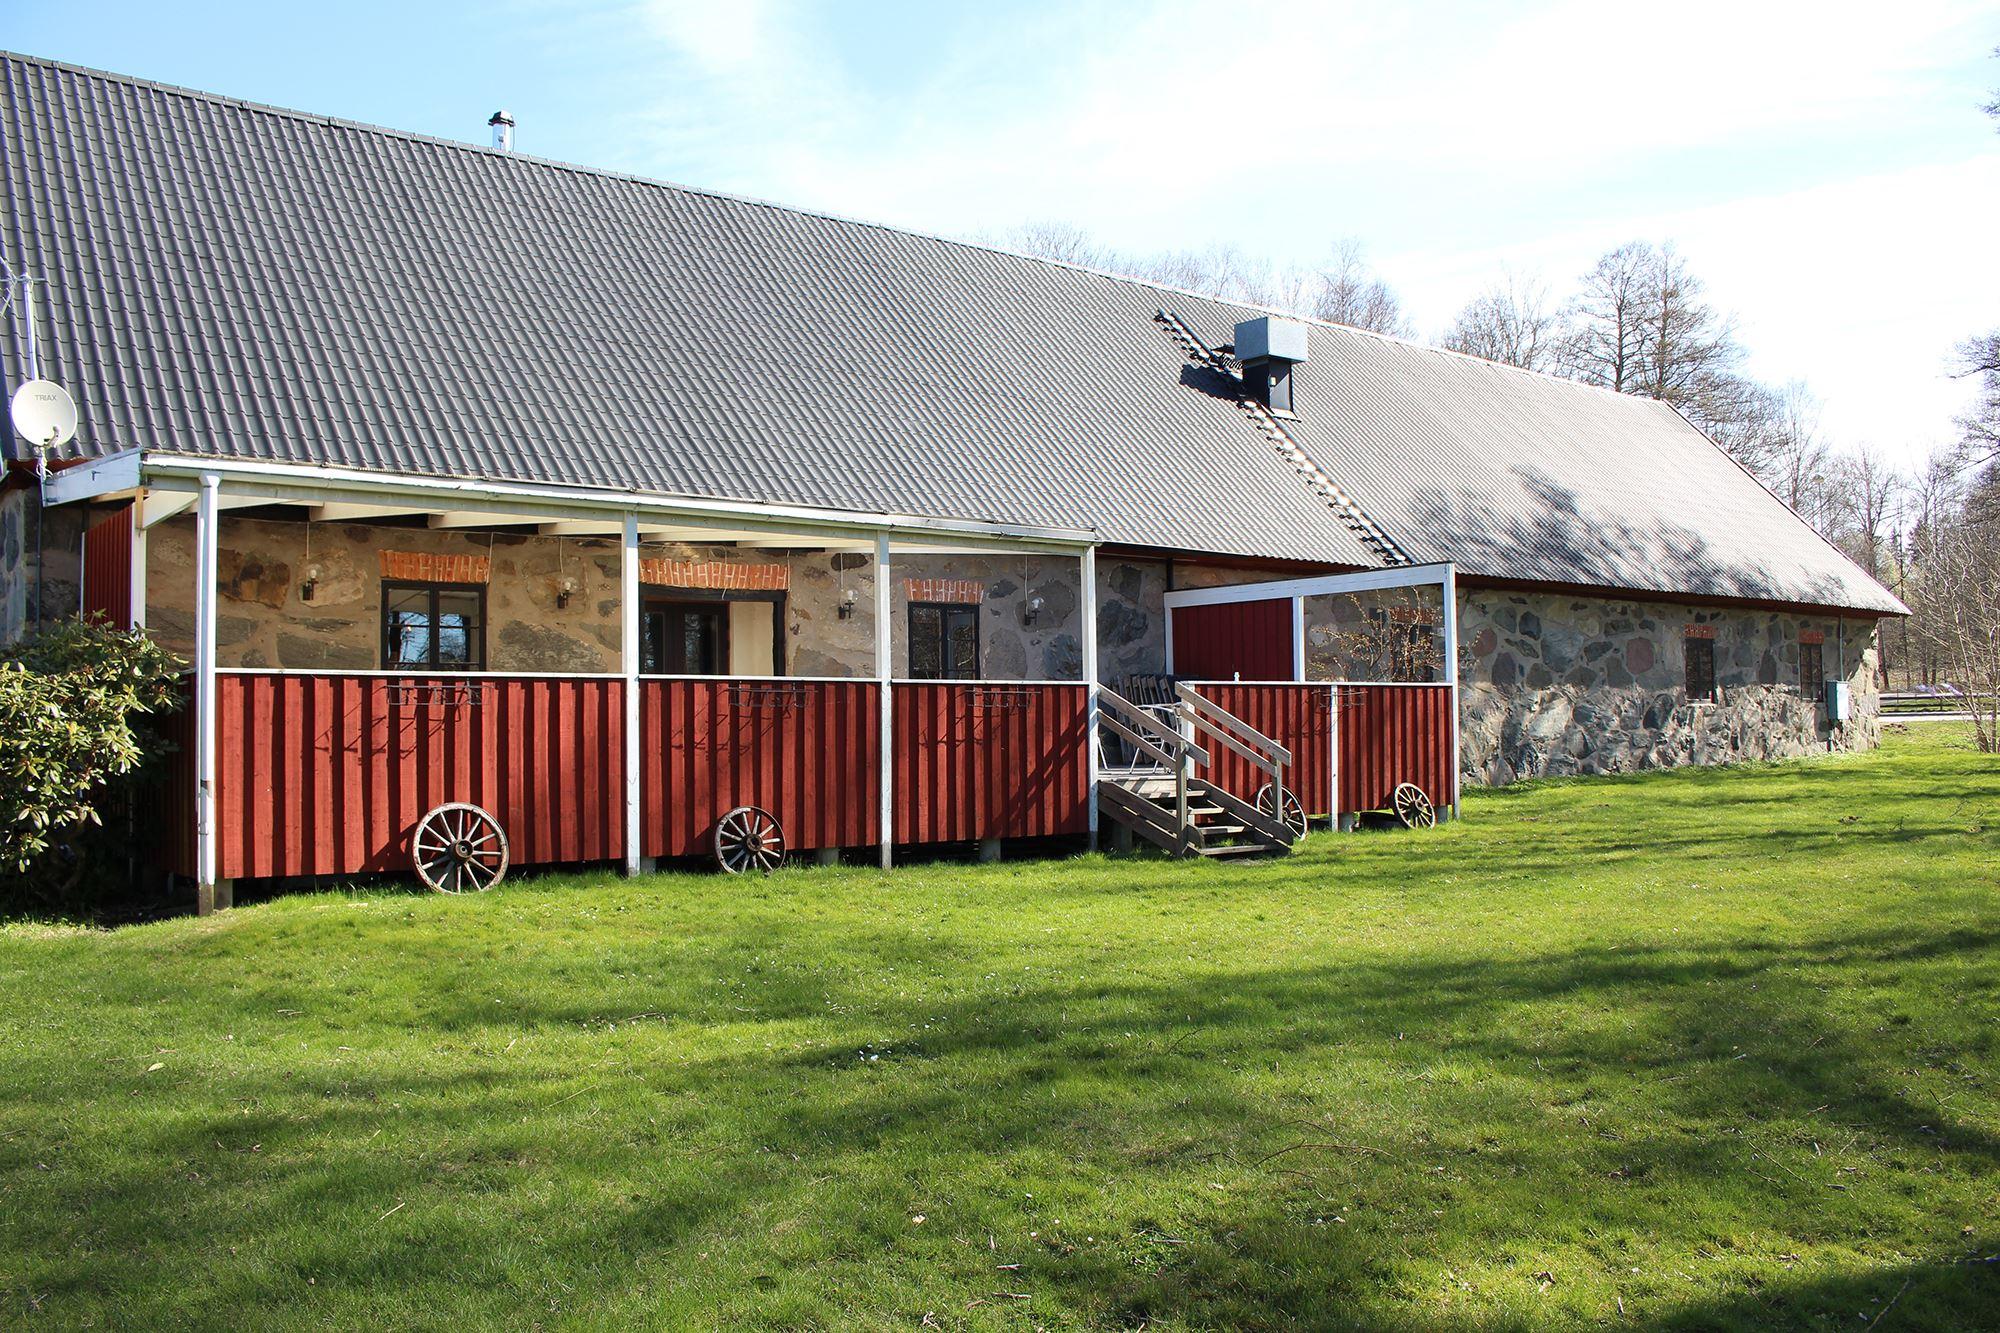 Sofia Carlsson,  © Tingsryds kommun, Restaurang Ladan